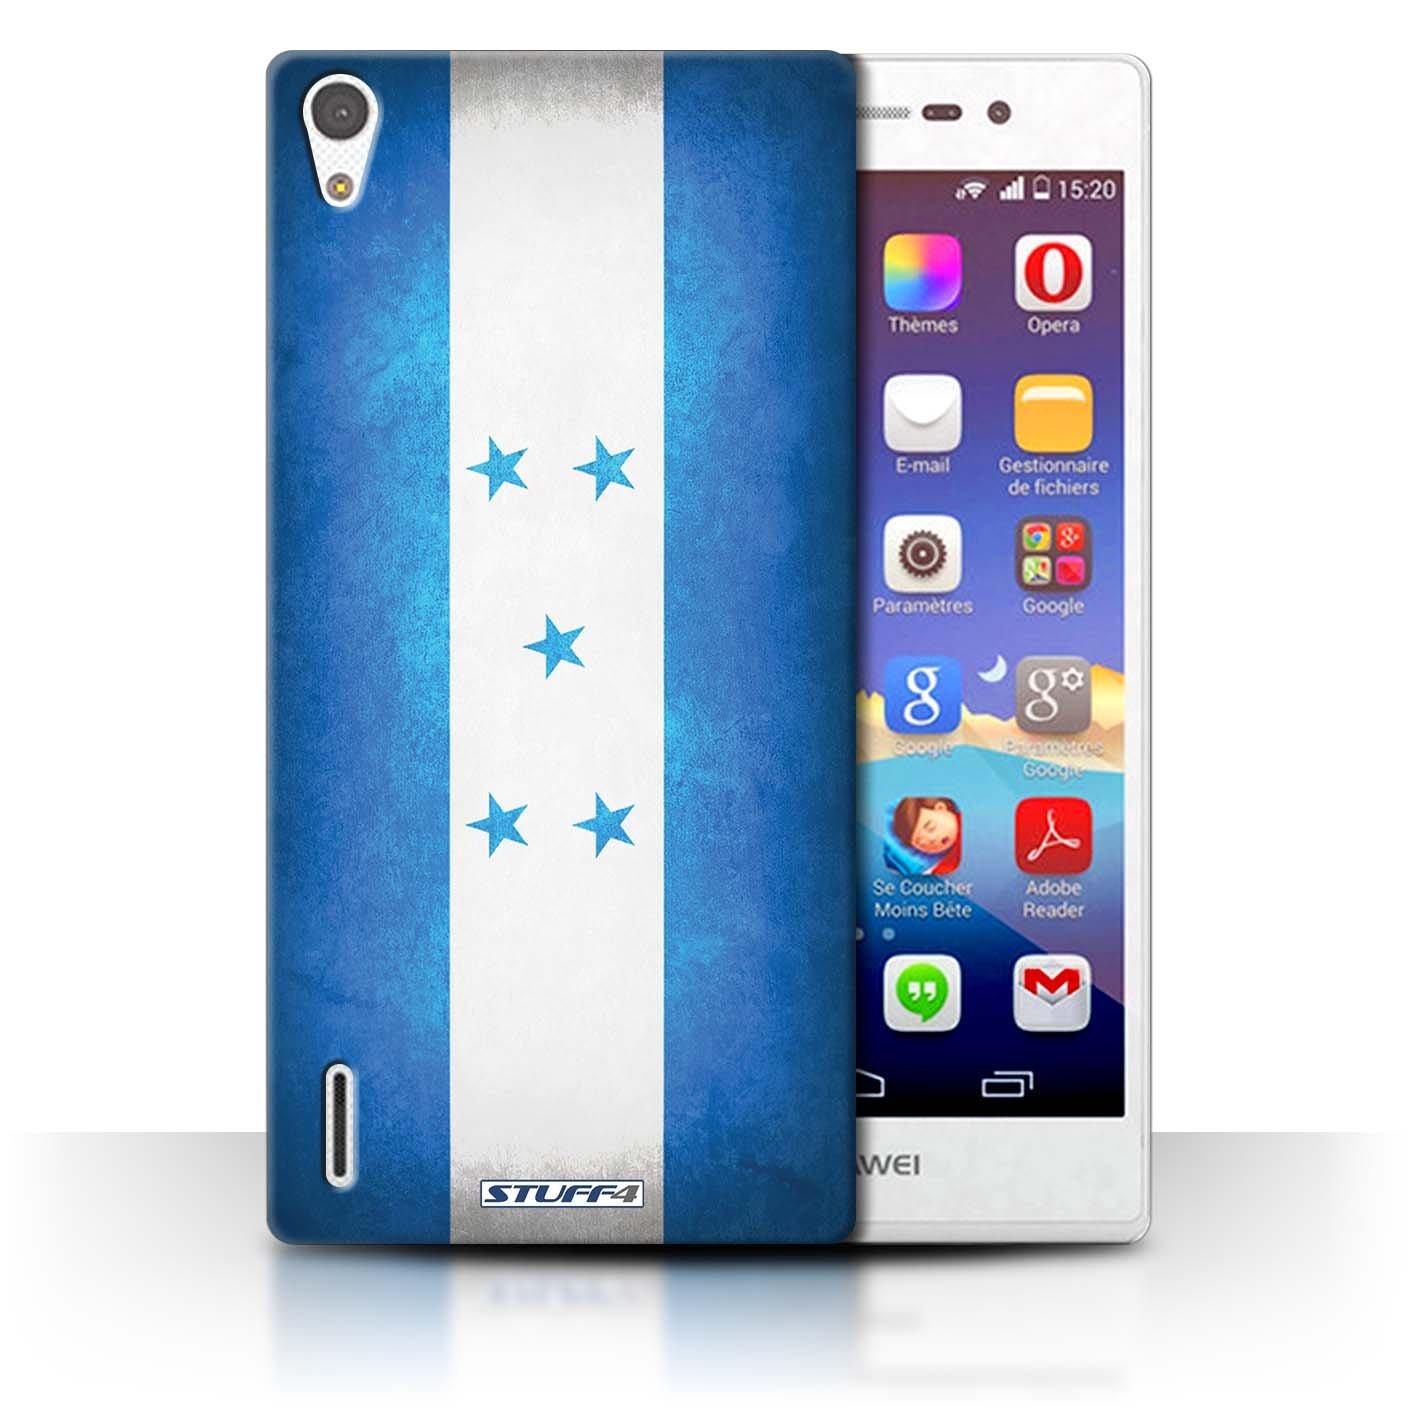 Carcasa/Funda STUFF4 dura para el Huawei Ascend P7 LTE ...